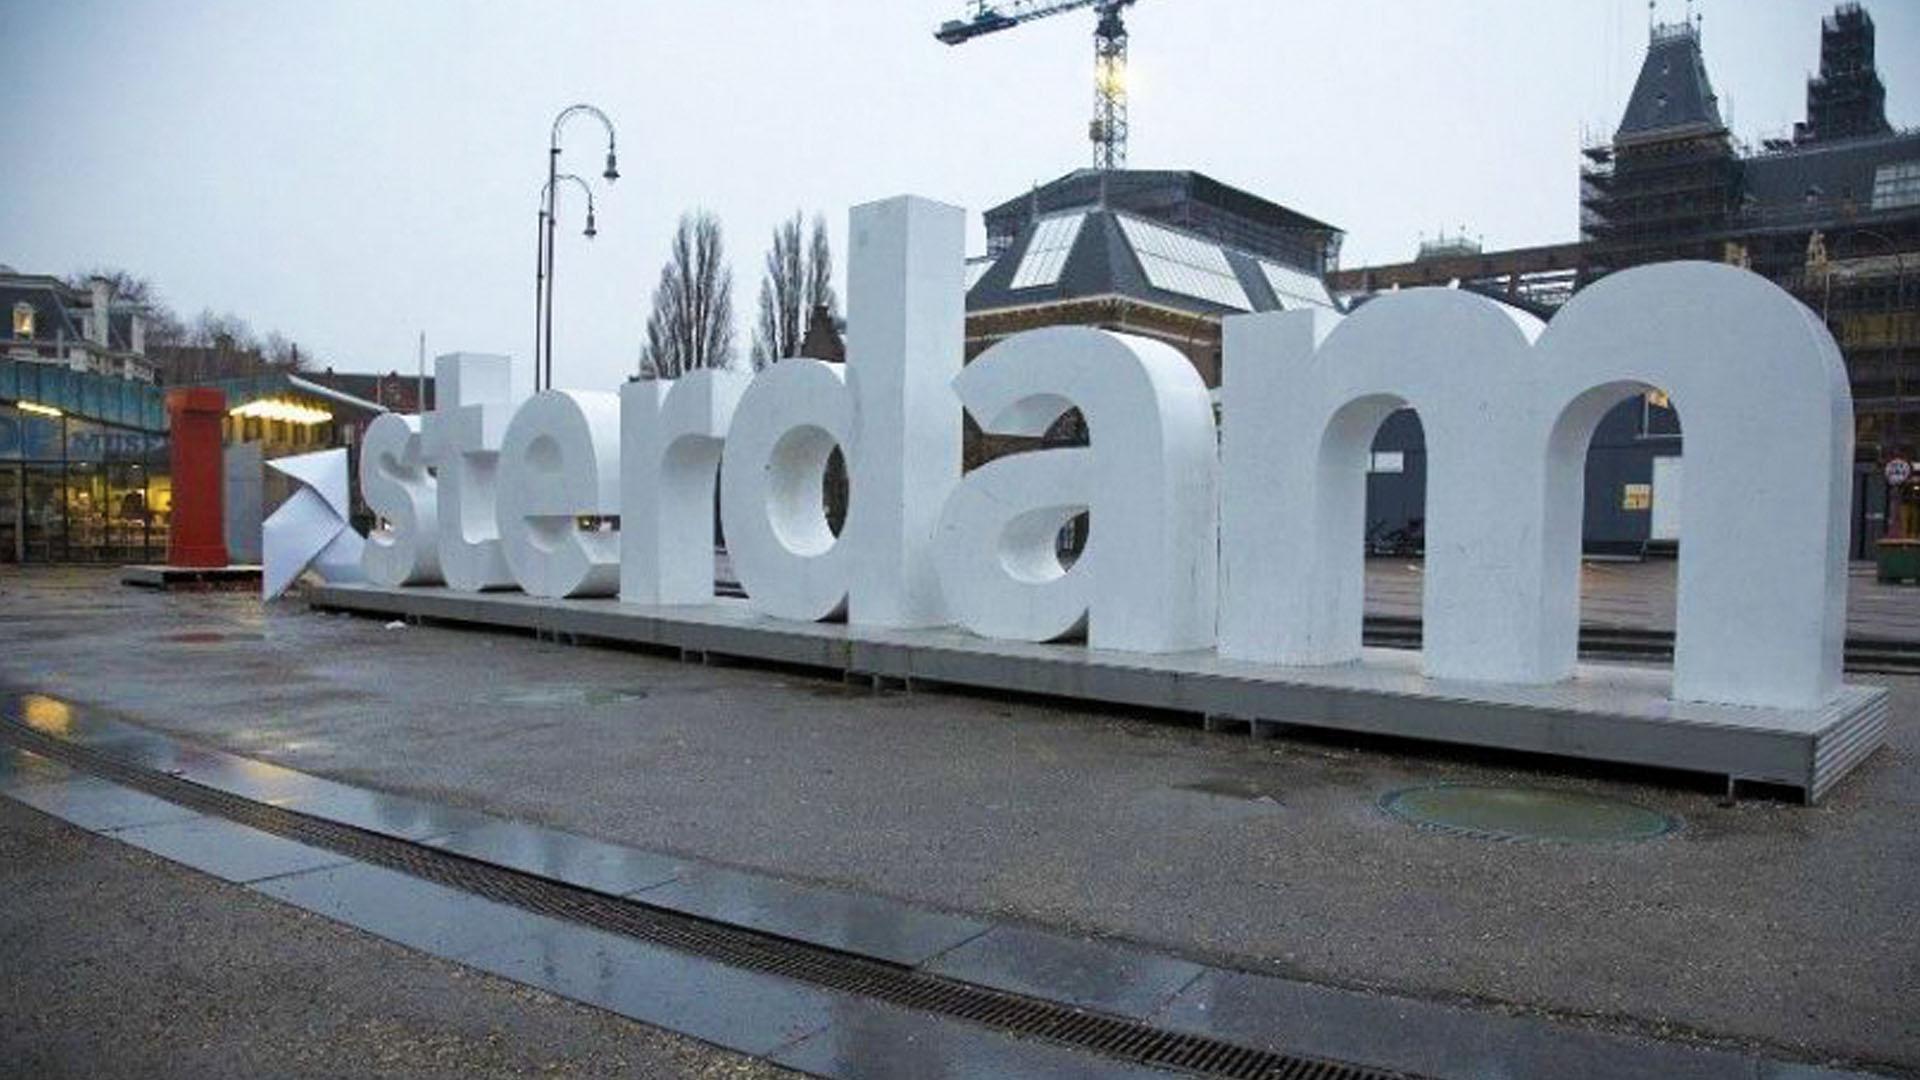 Playstation-Origami-I-Amsterdam-guerilla-actie